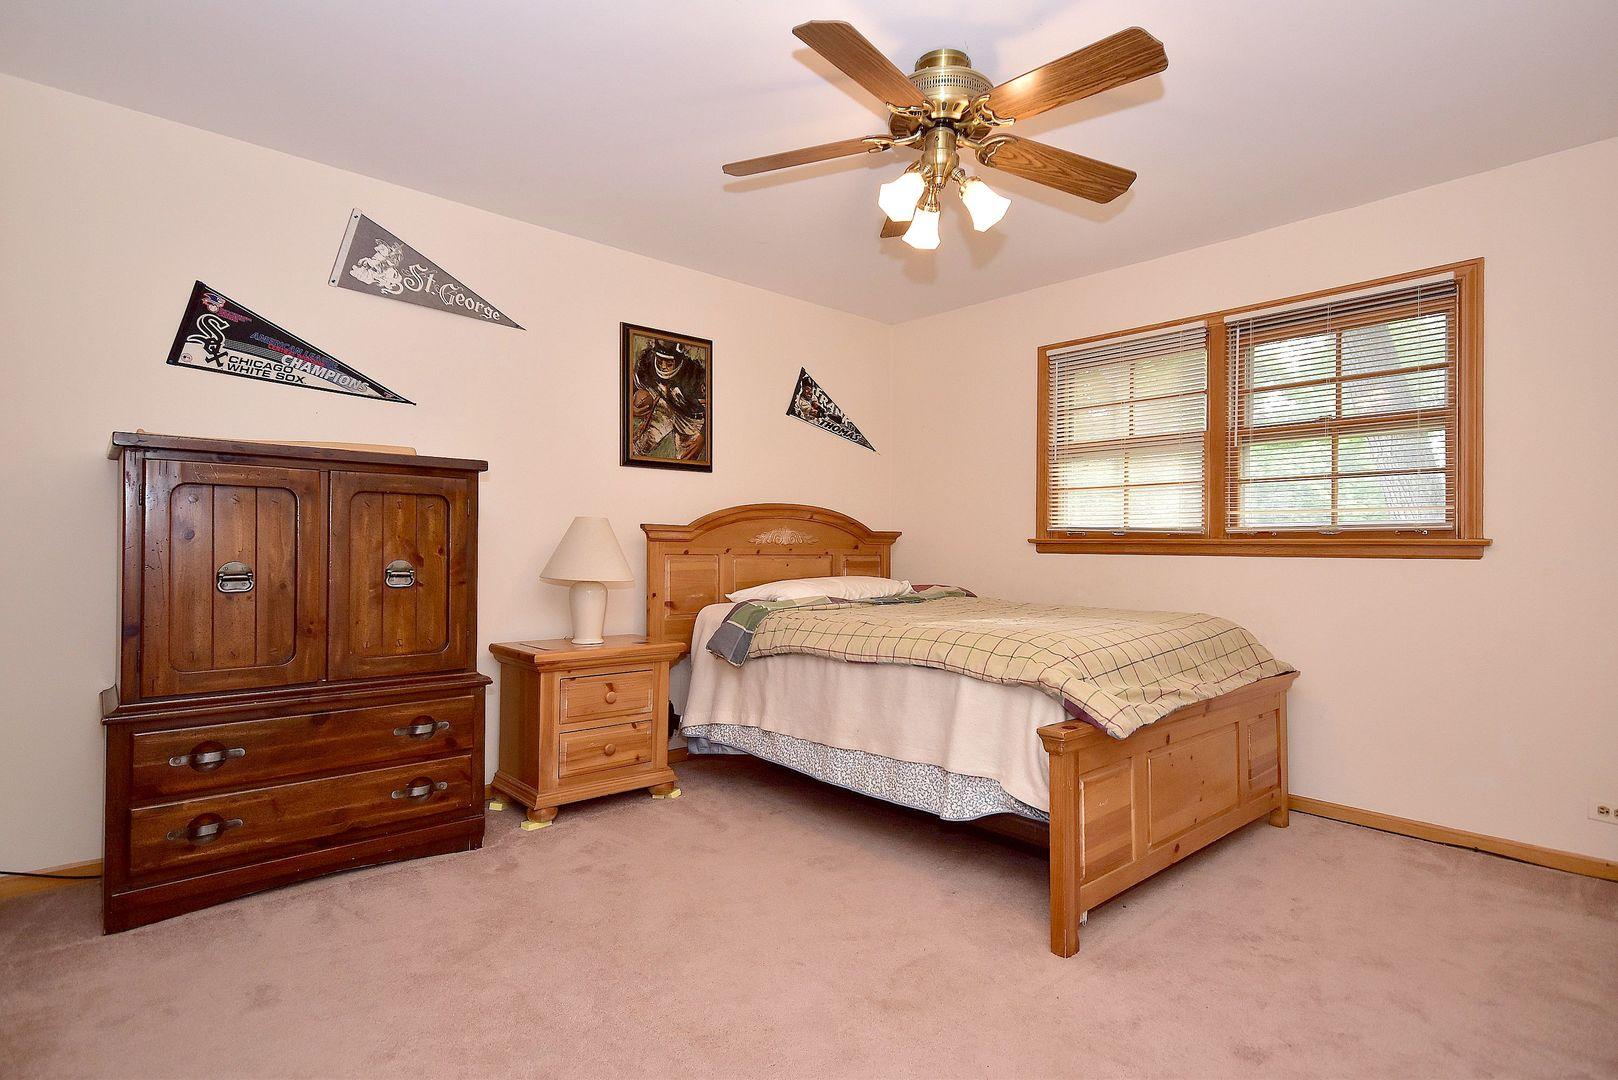 811 South Waverly, Mount Prospect, Illinois, 60056